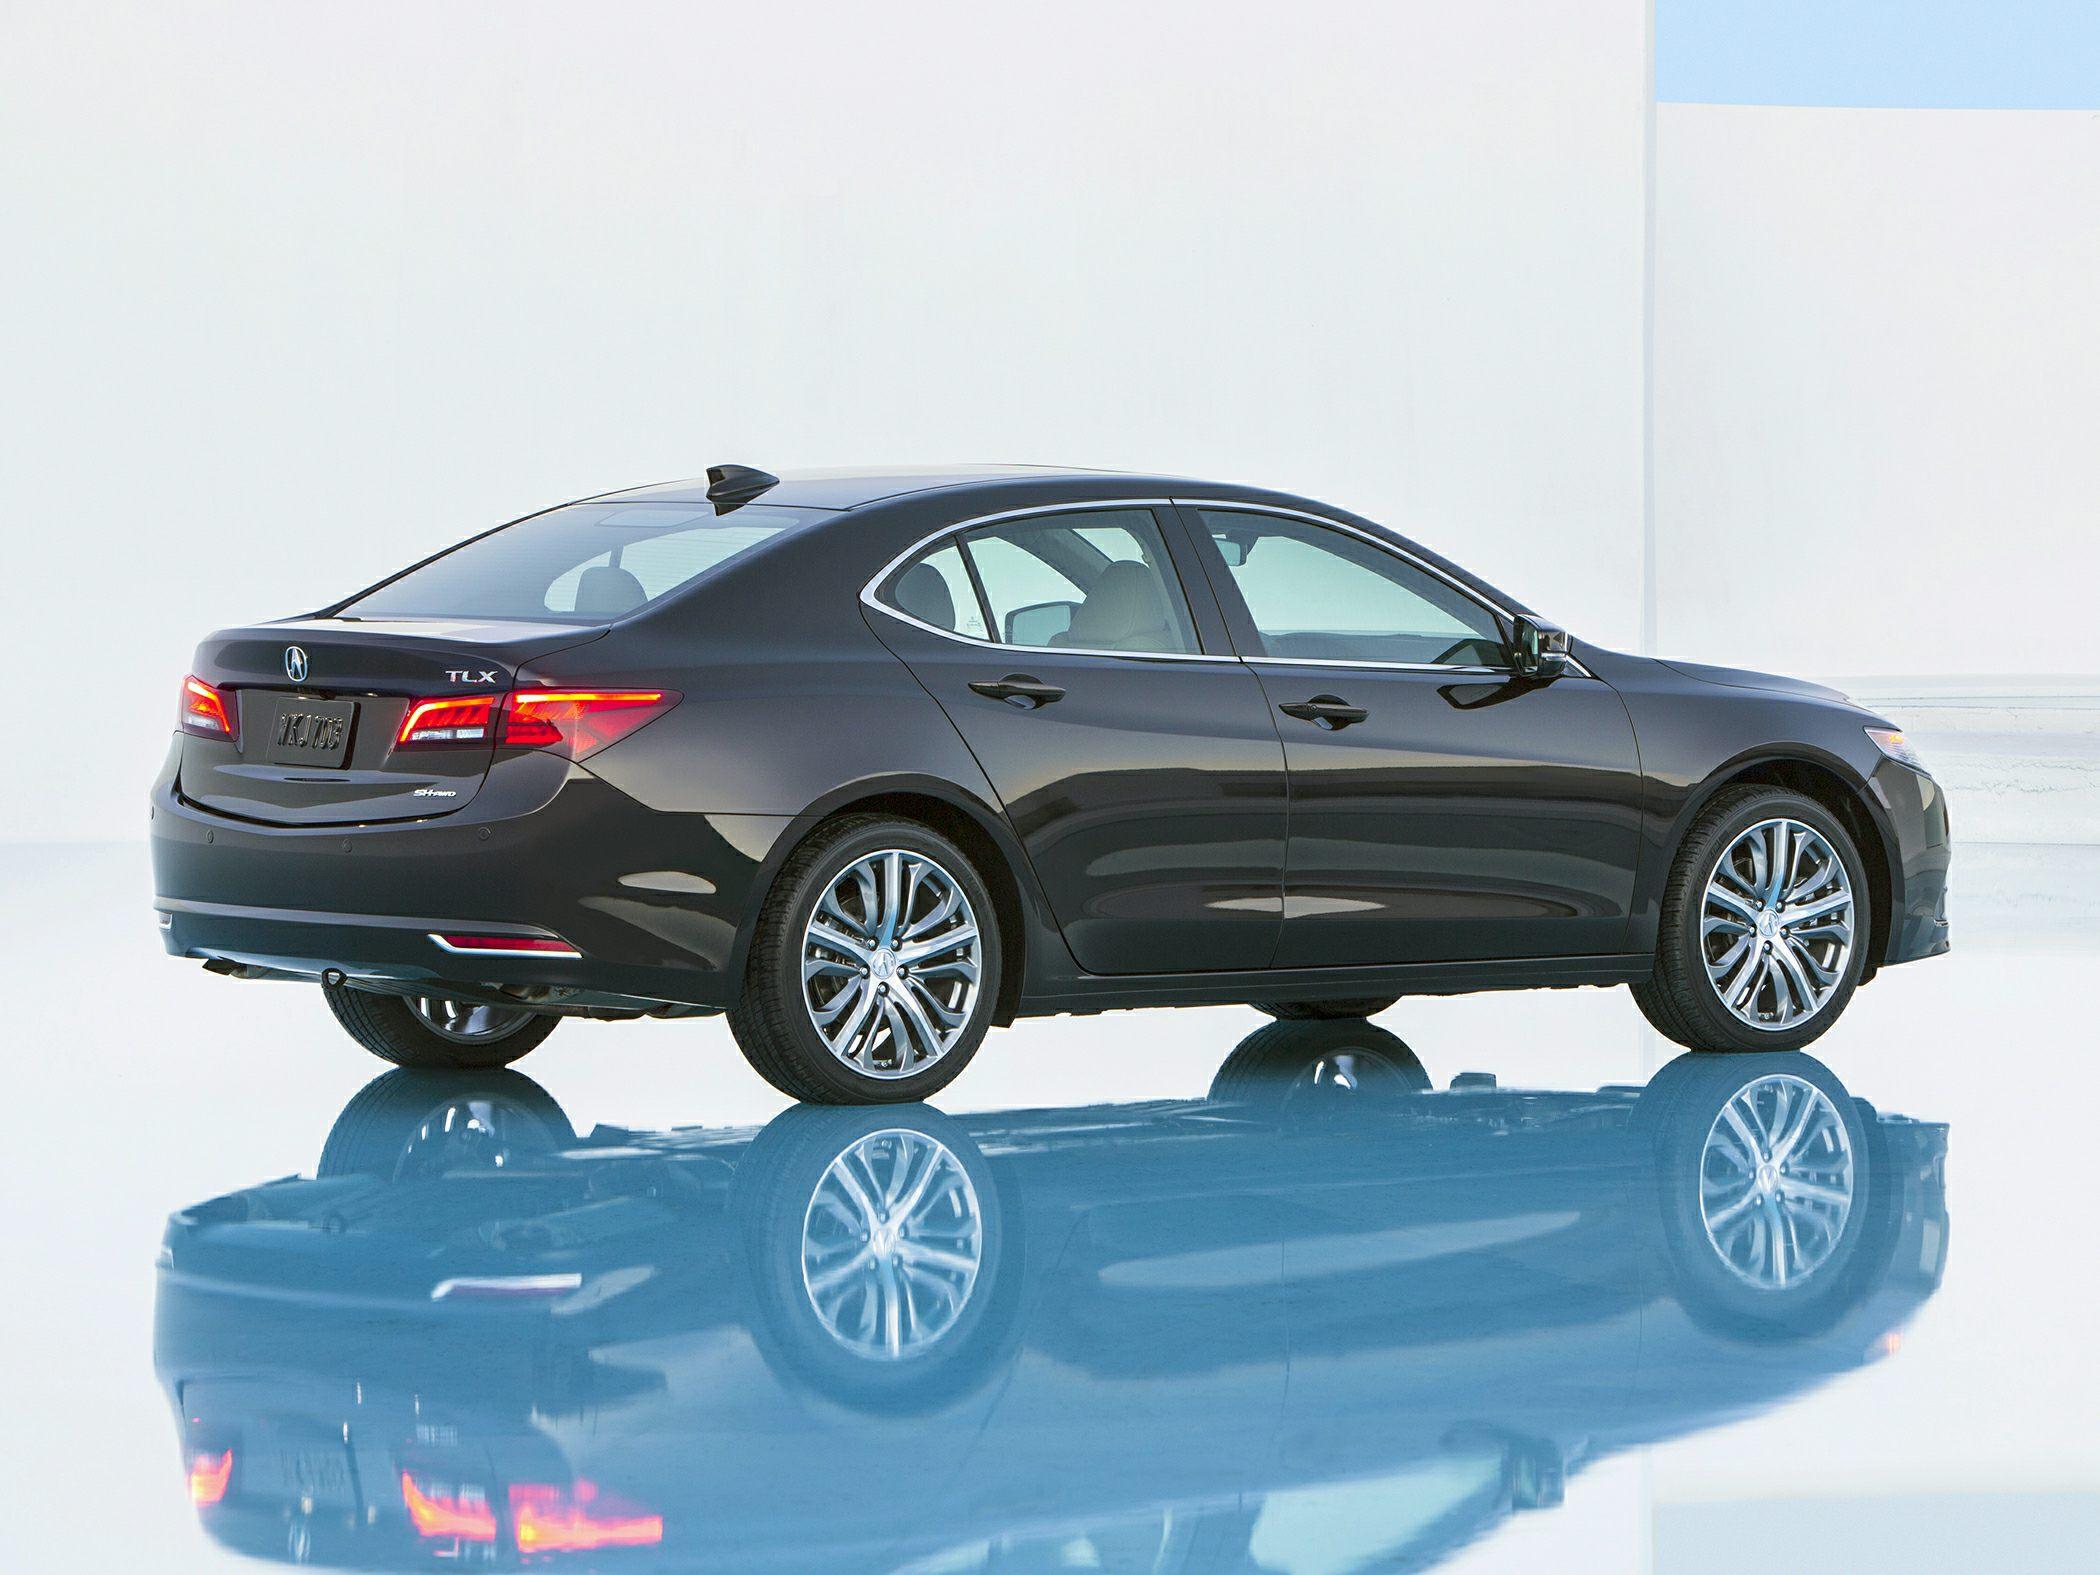 Acura TLX Rear Quarter